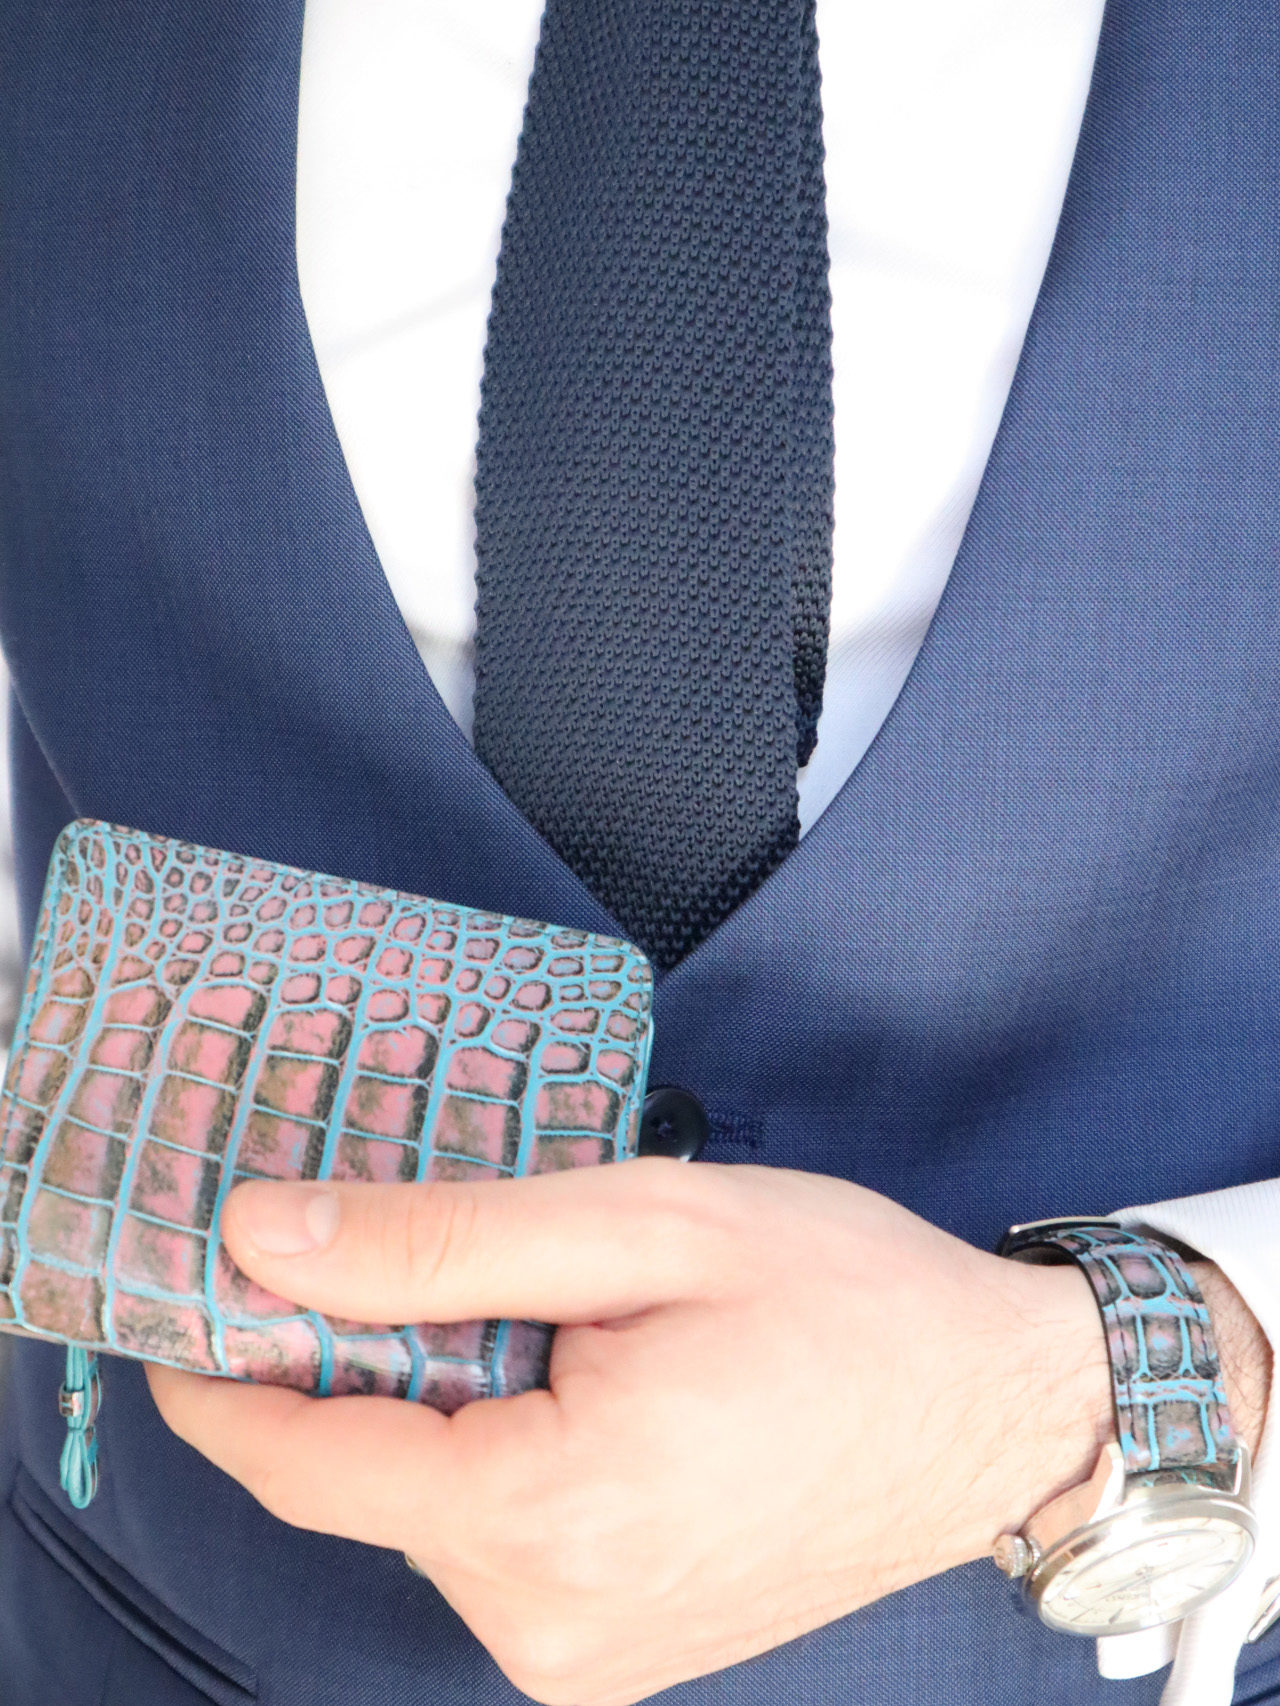 Alligator mini wallet